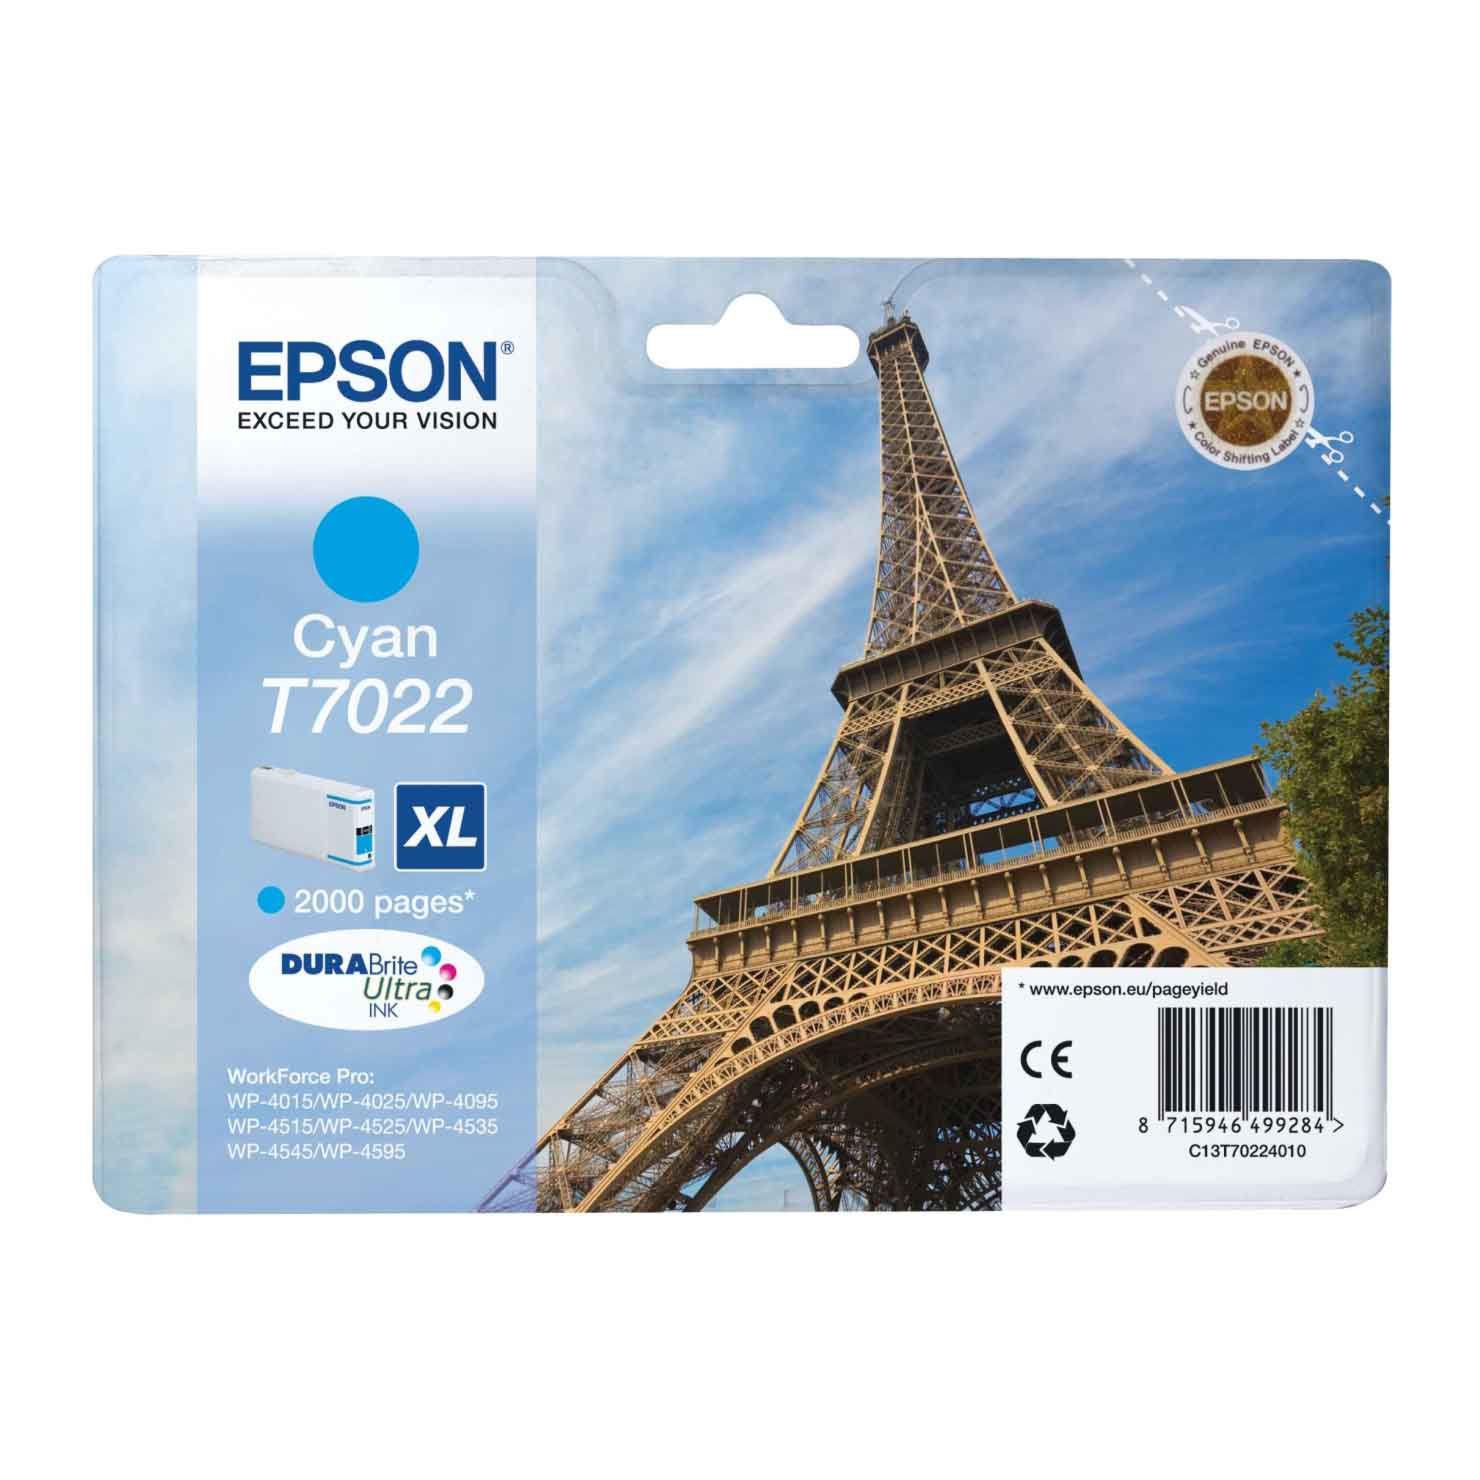 Epson T7022 XL Ink Cartridge - Cyan